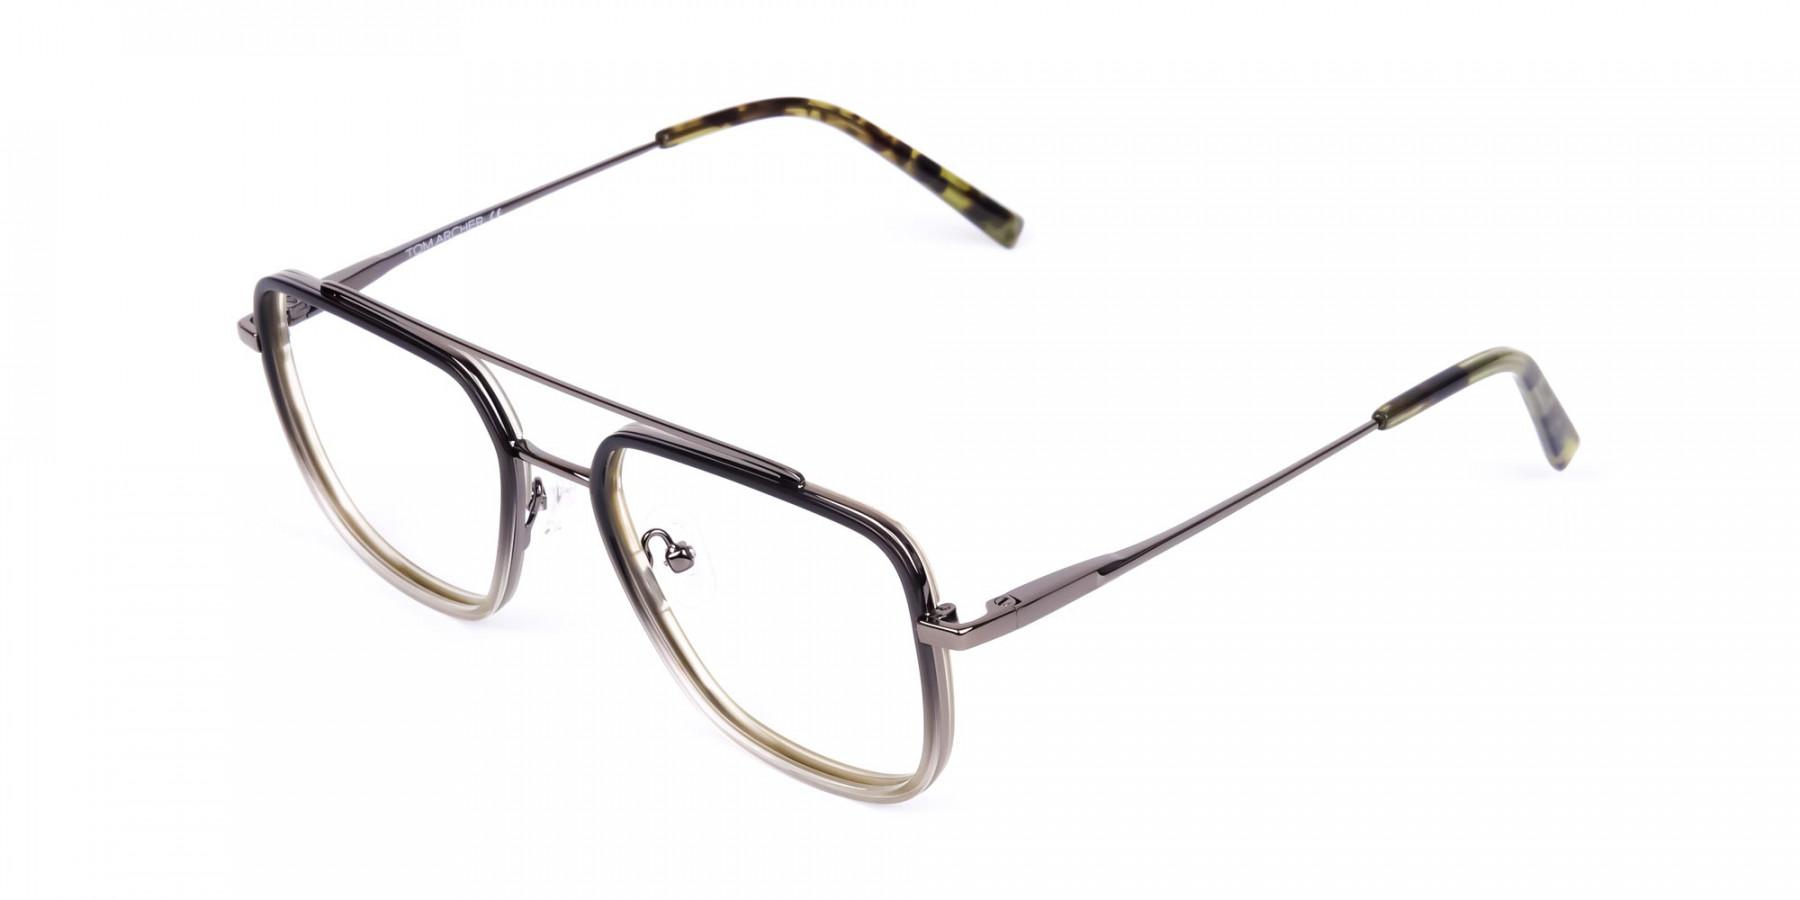 Dark-Green-and-Silver-Aviator-Glasses-1